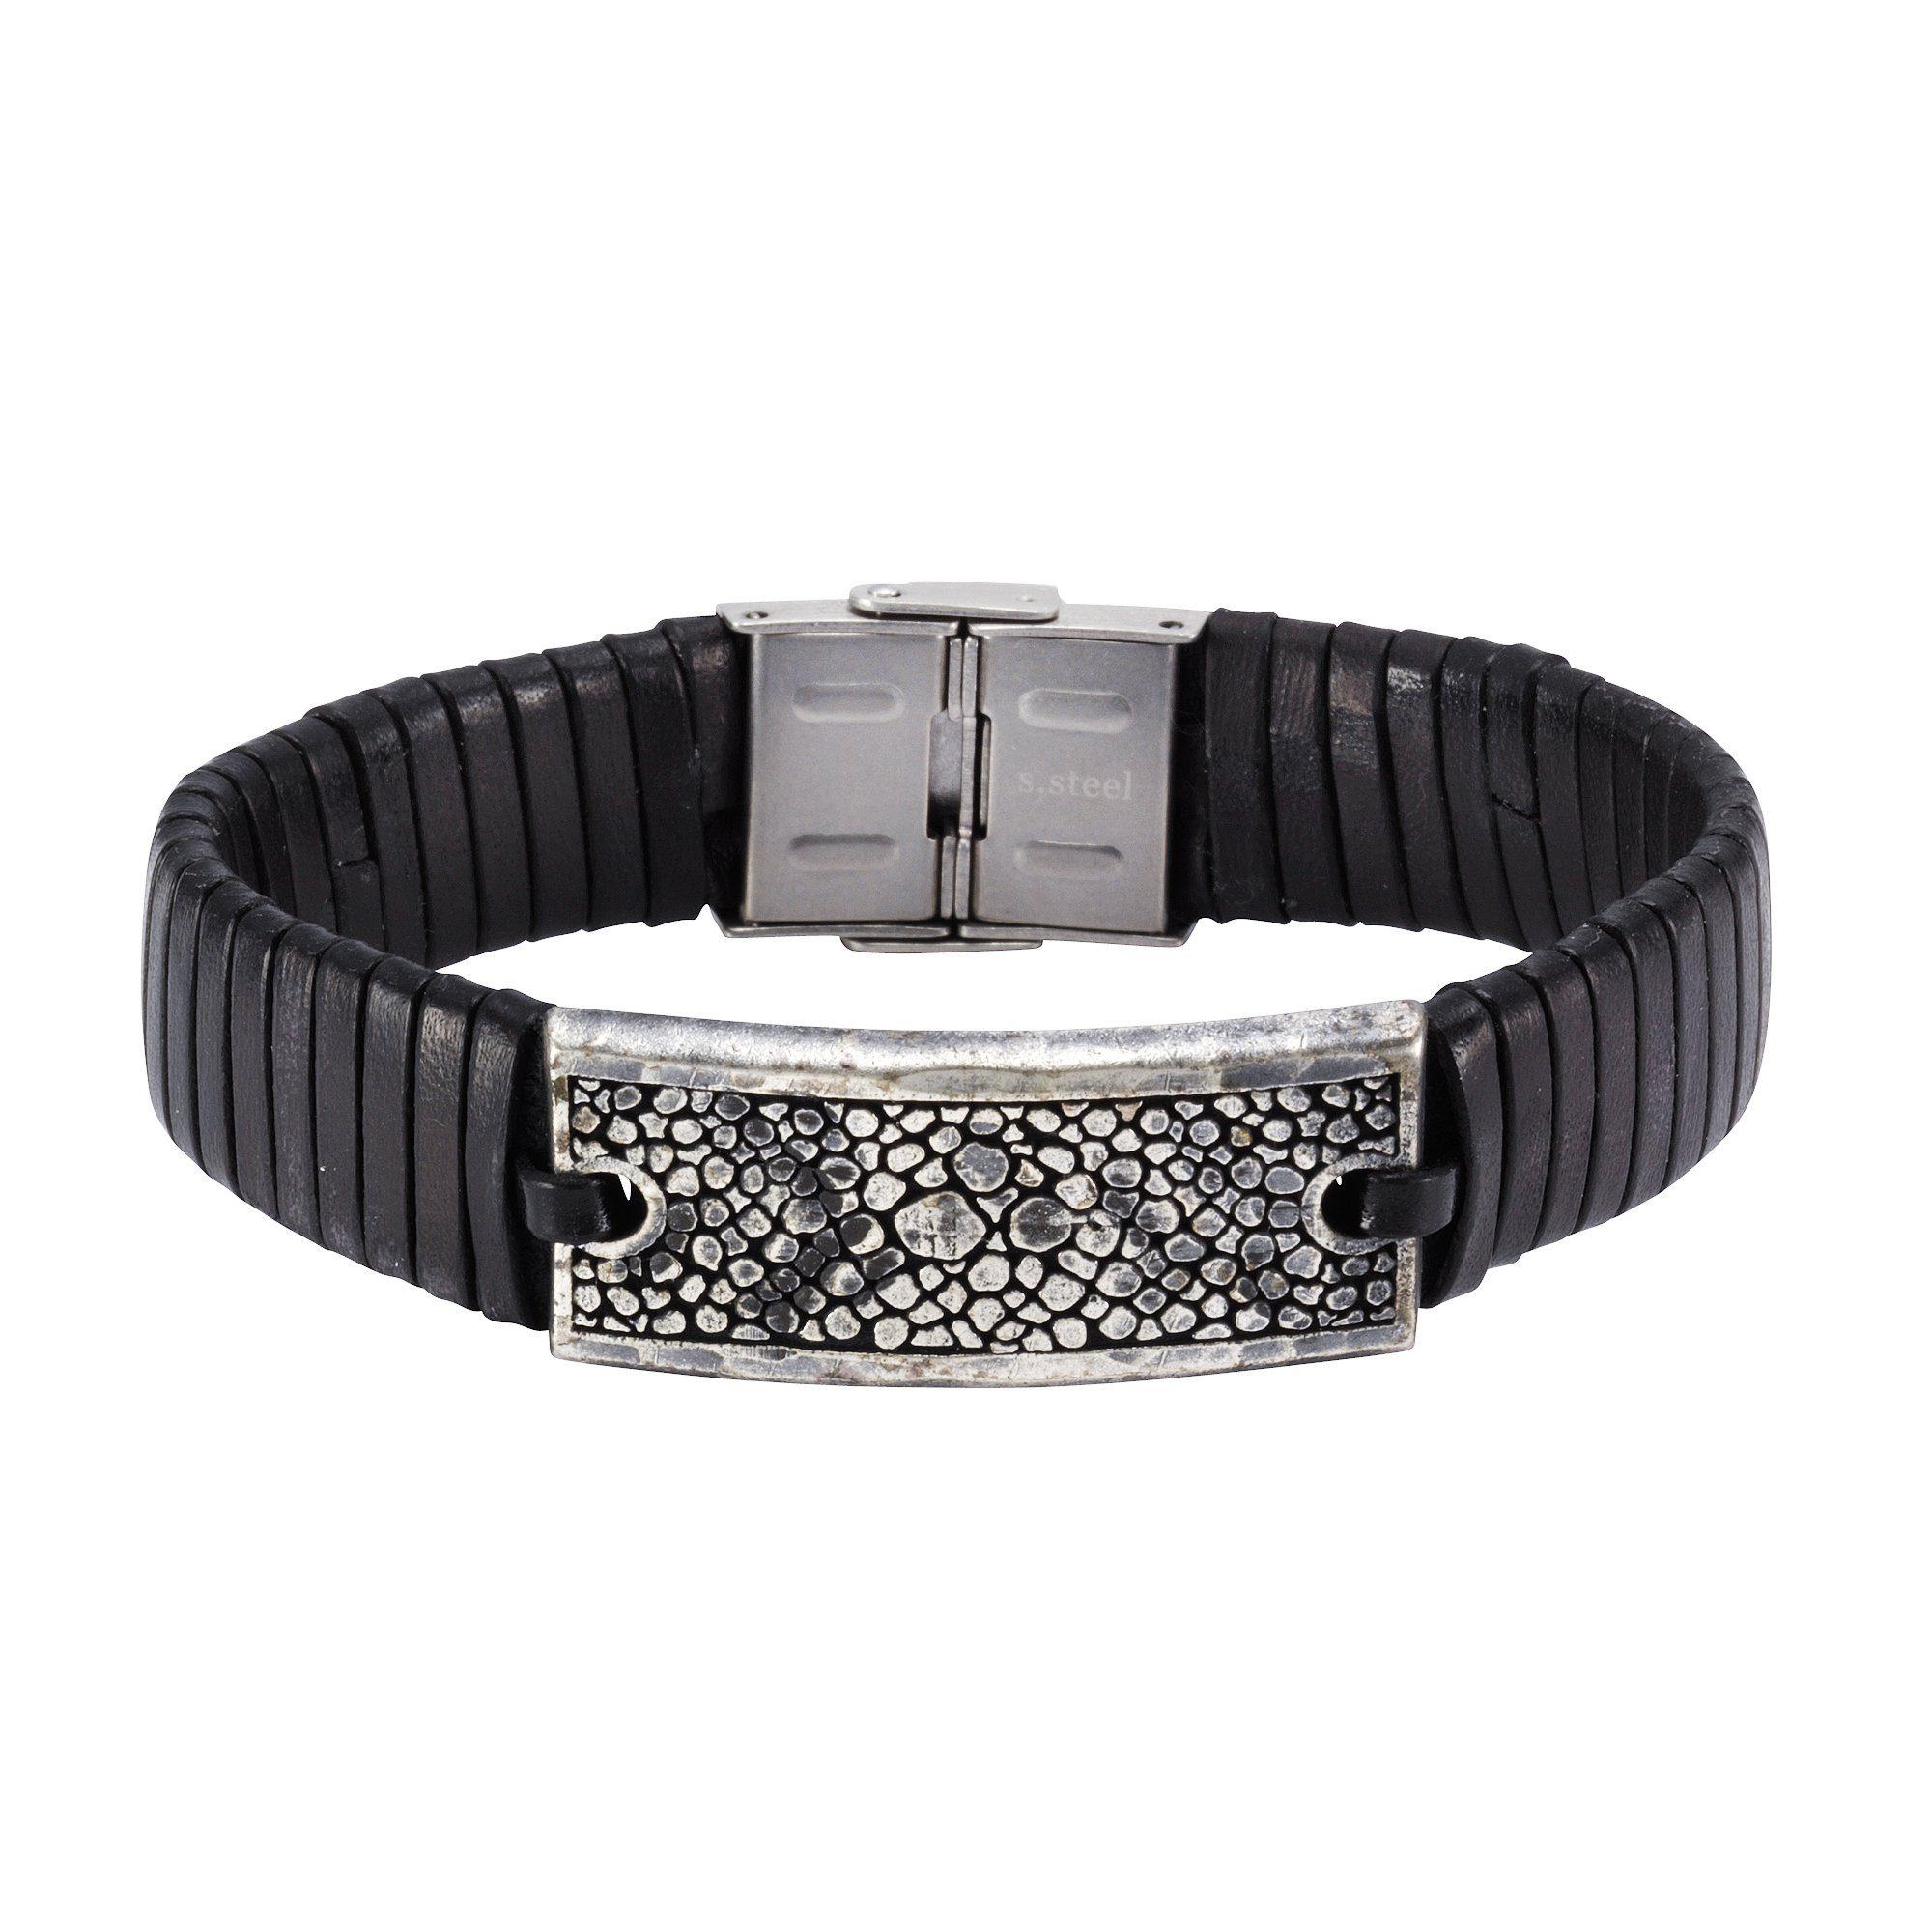 NOX Armband Leder schwarz Edelstahl   Schmuck > Armbänder > Sonstige Armbänder   Schwarz   Leder   Nox